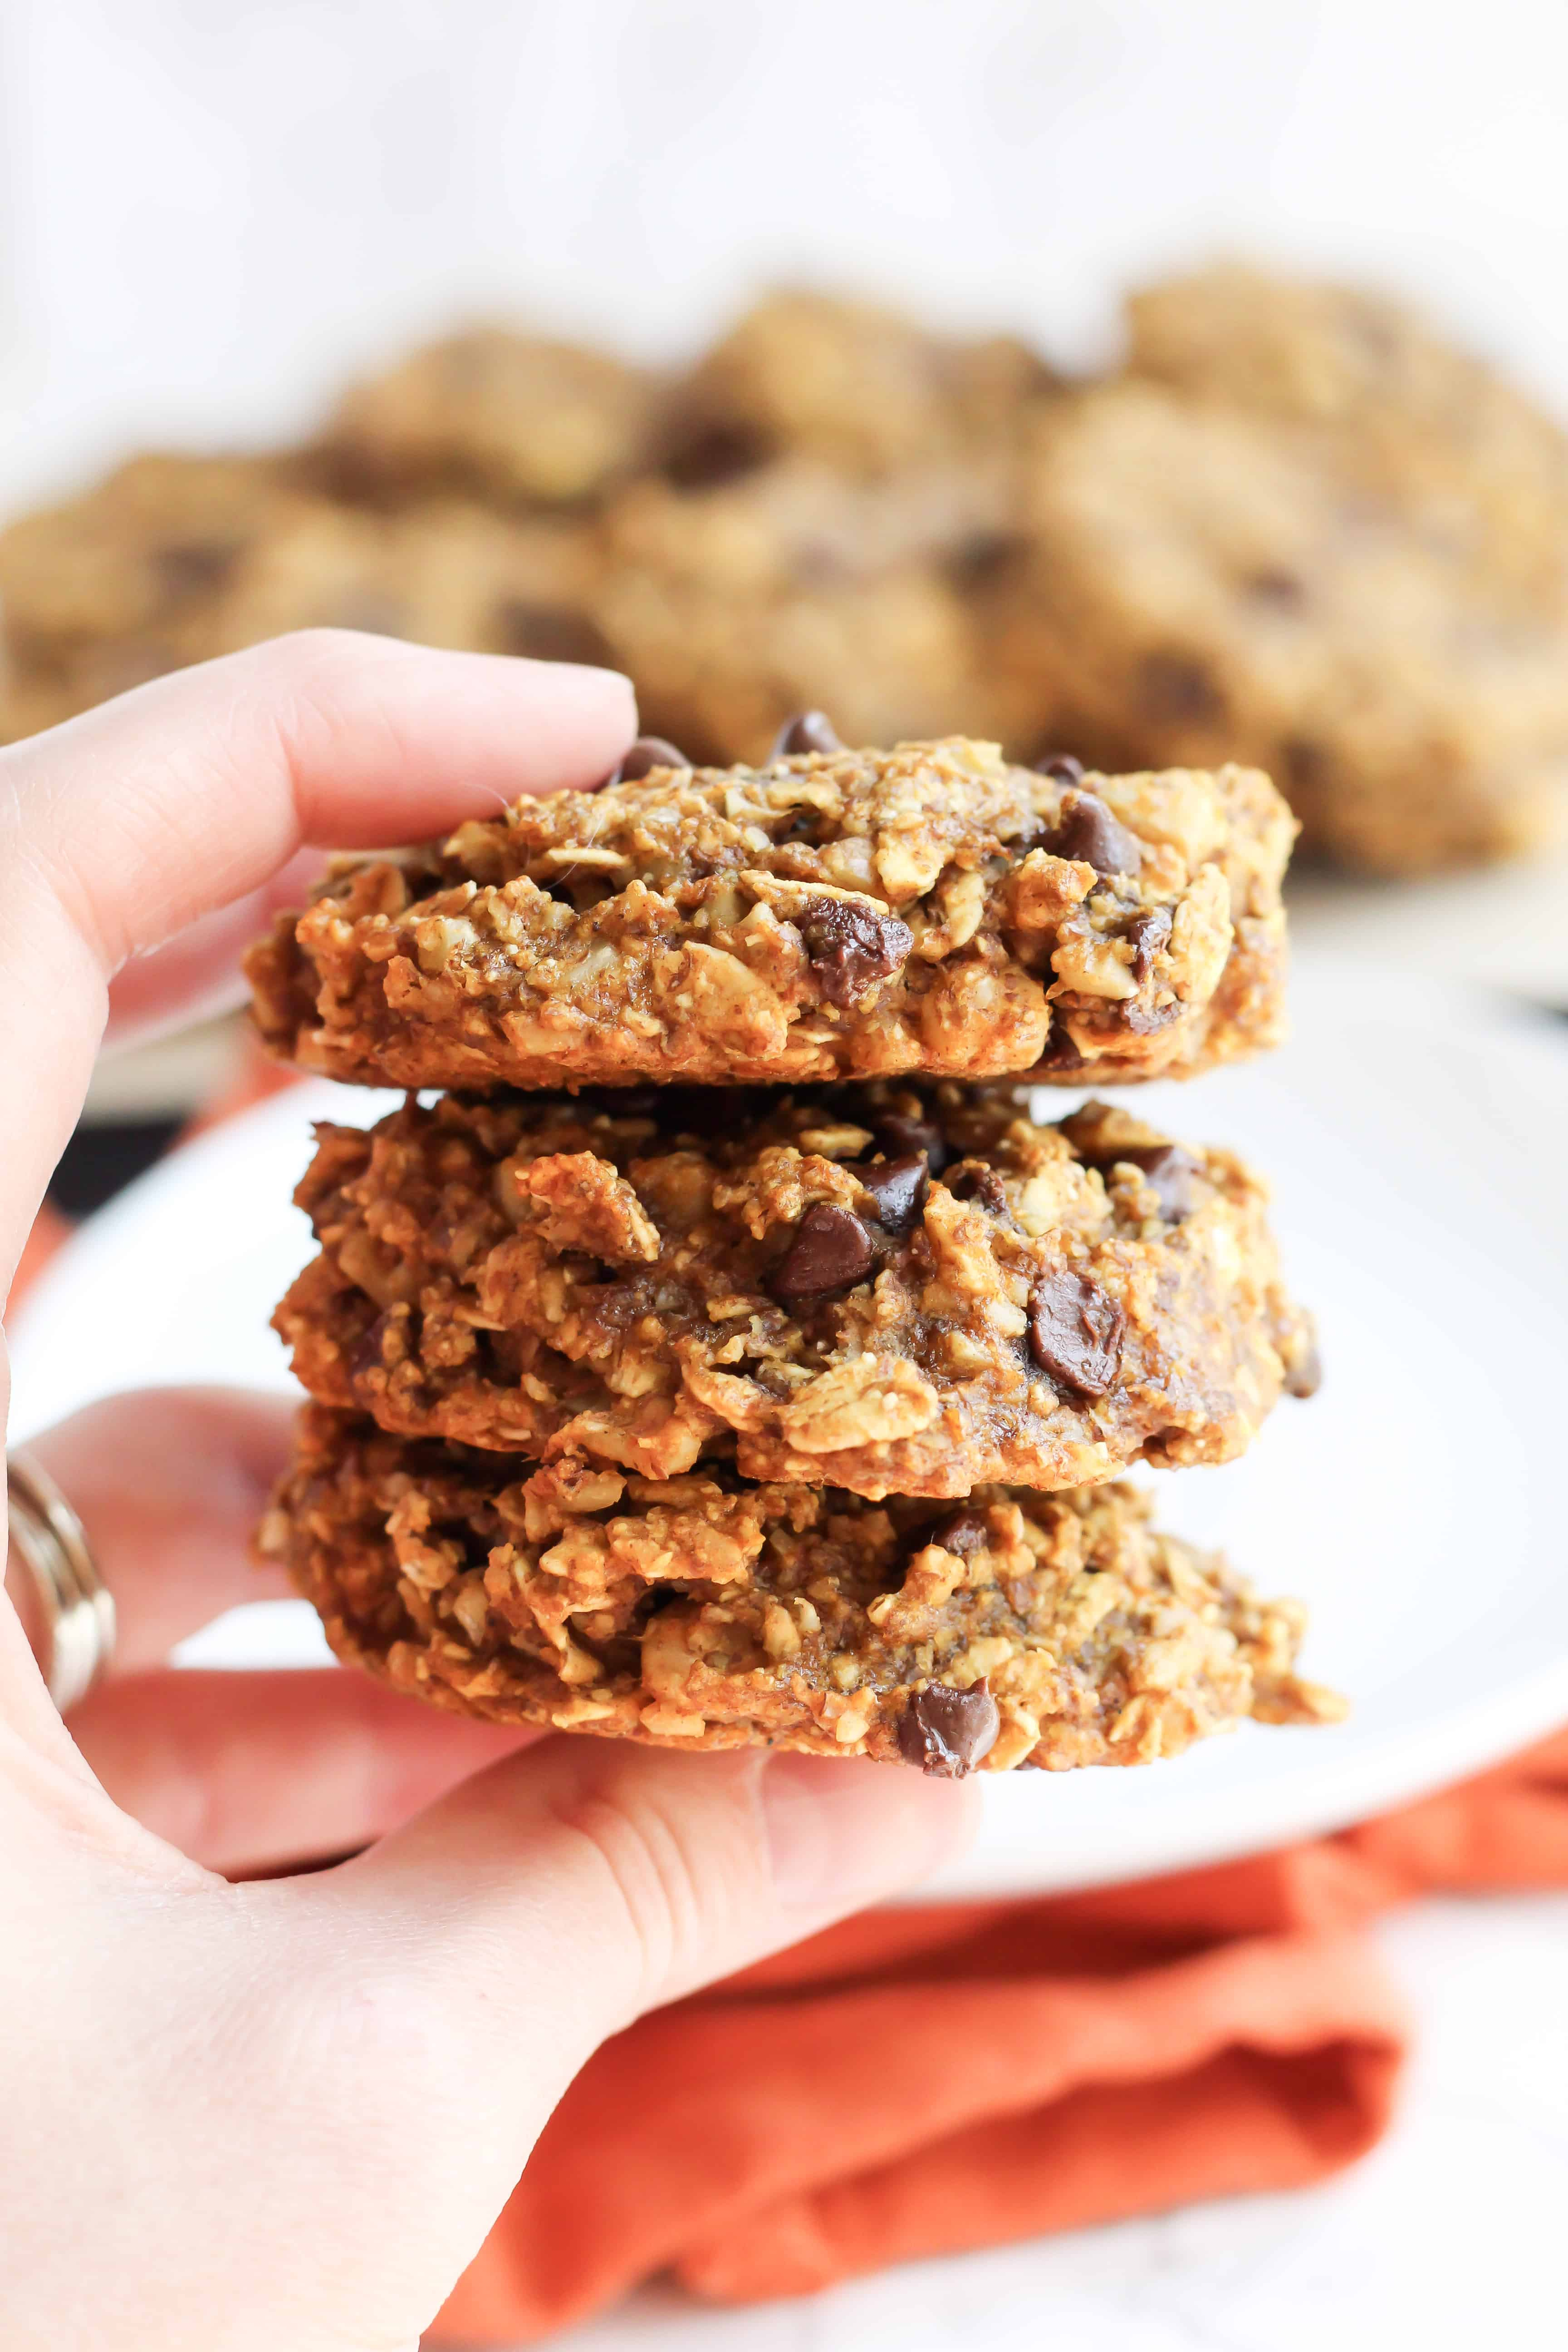 Pumpkin Chocolate Chip Breakfast Cookies (gluten-free, whole grain, refined sugar-free)